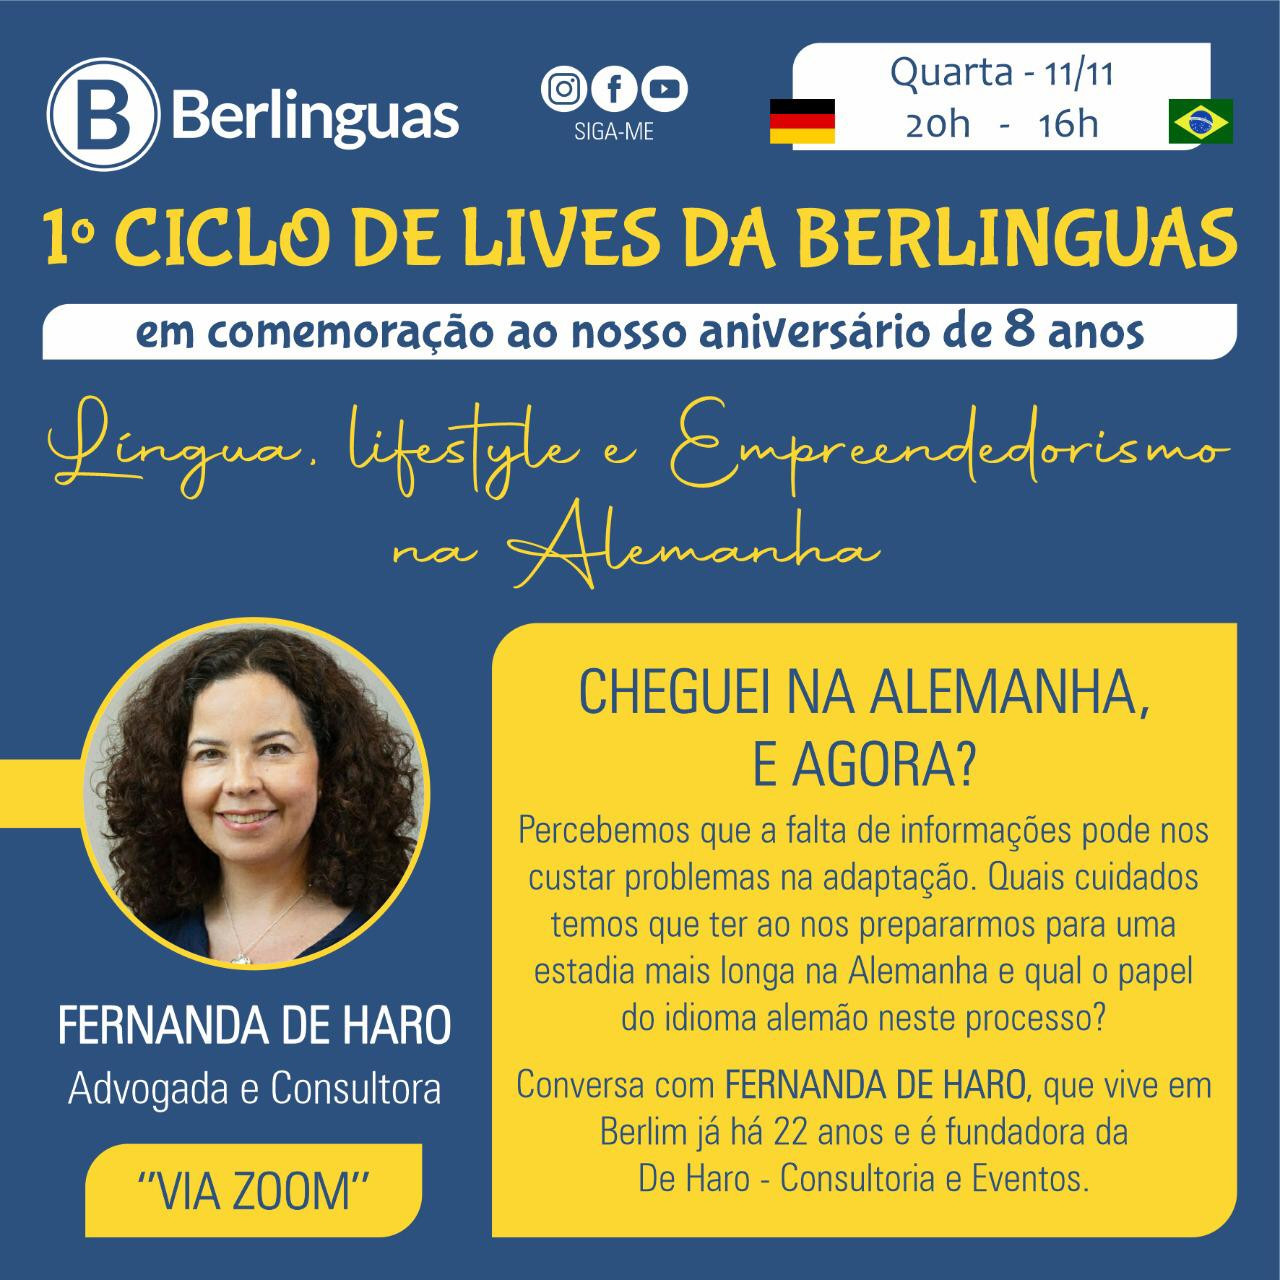 1-ciclo-de-lives-da-berlinguas-fernanda-de-haro